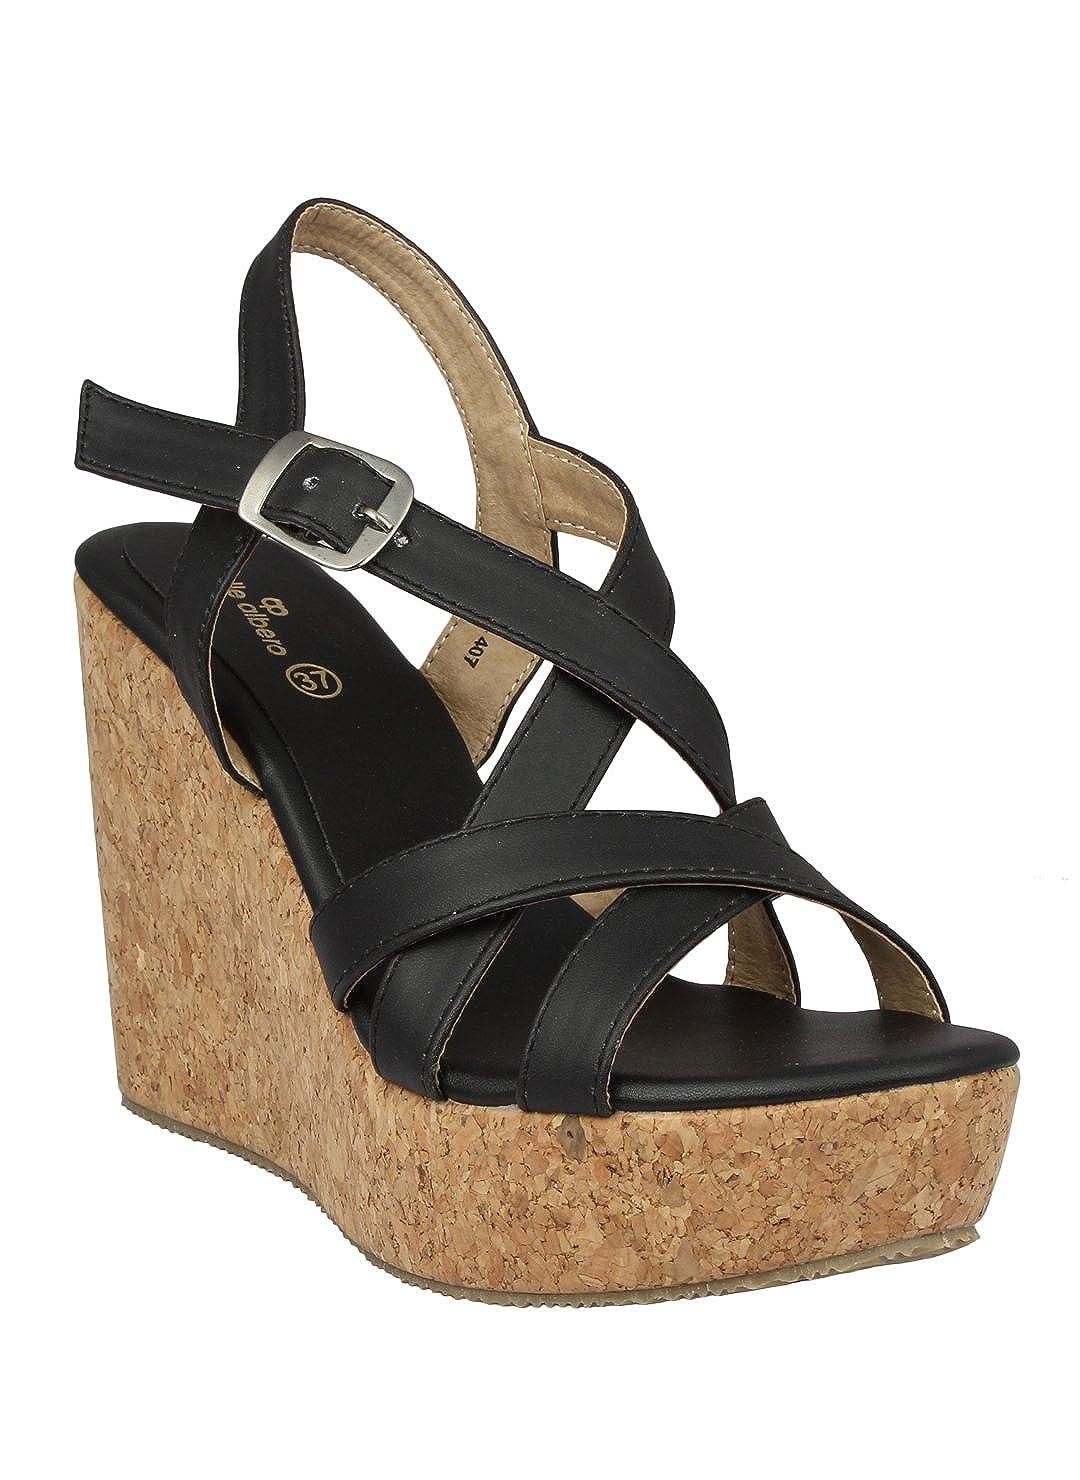 Buy pelle albero Womens Platform Heel